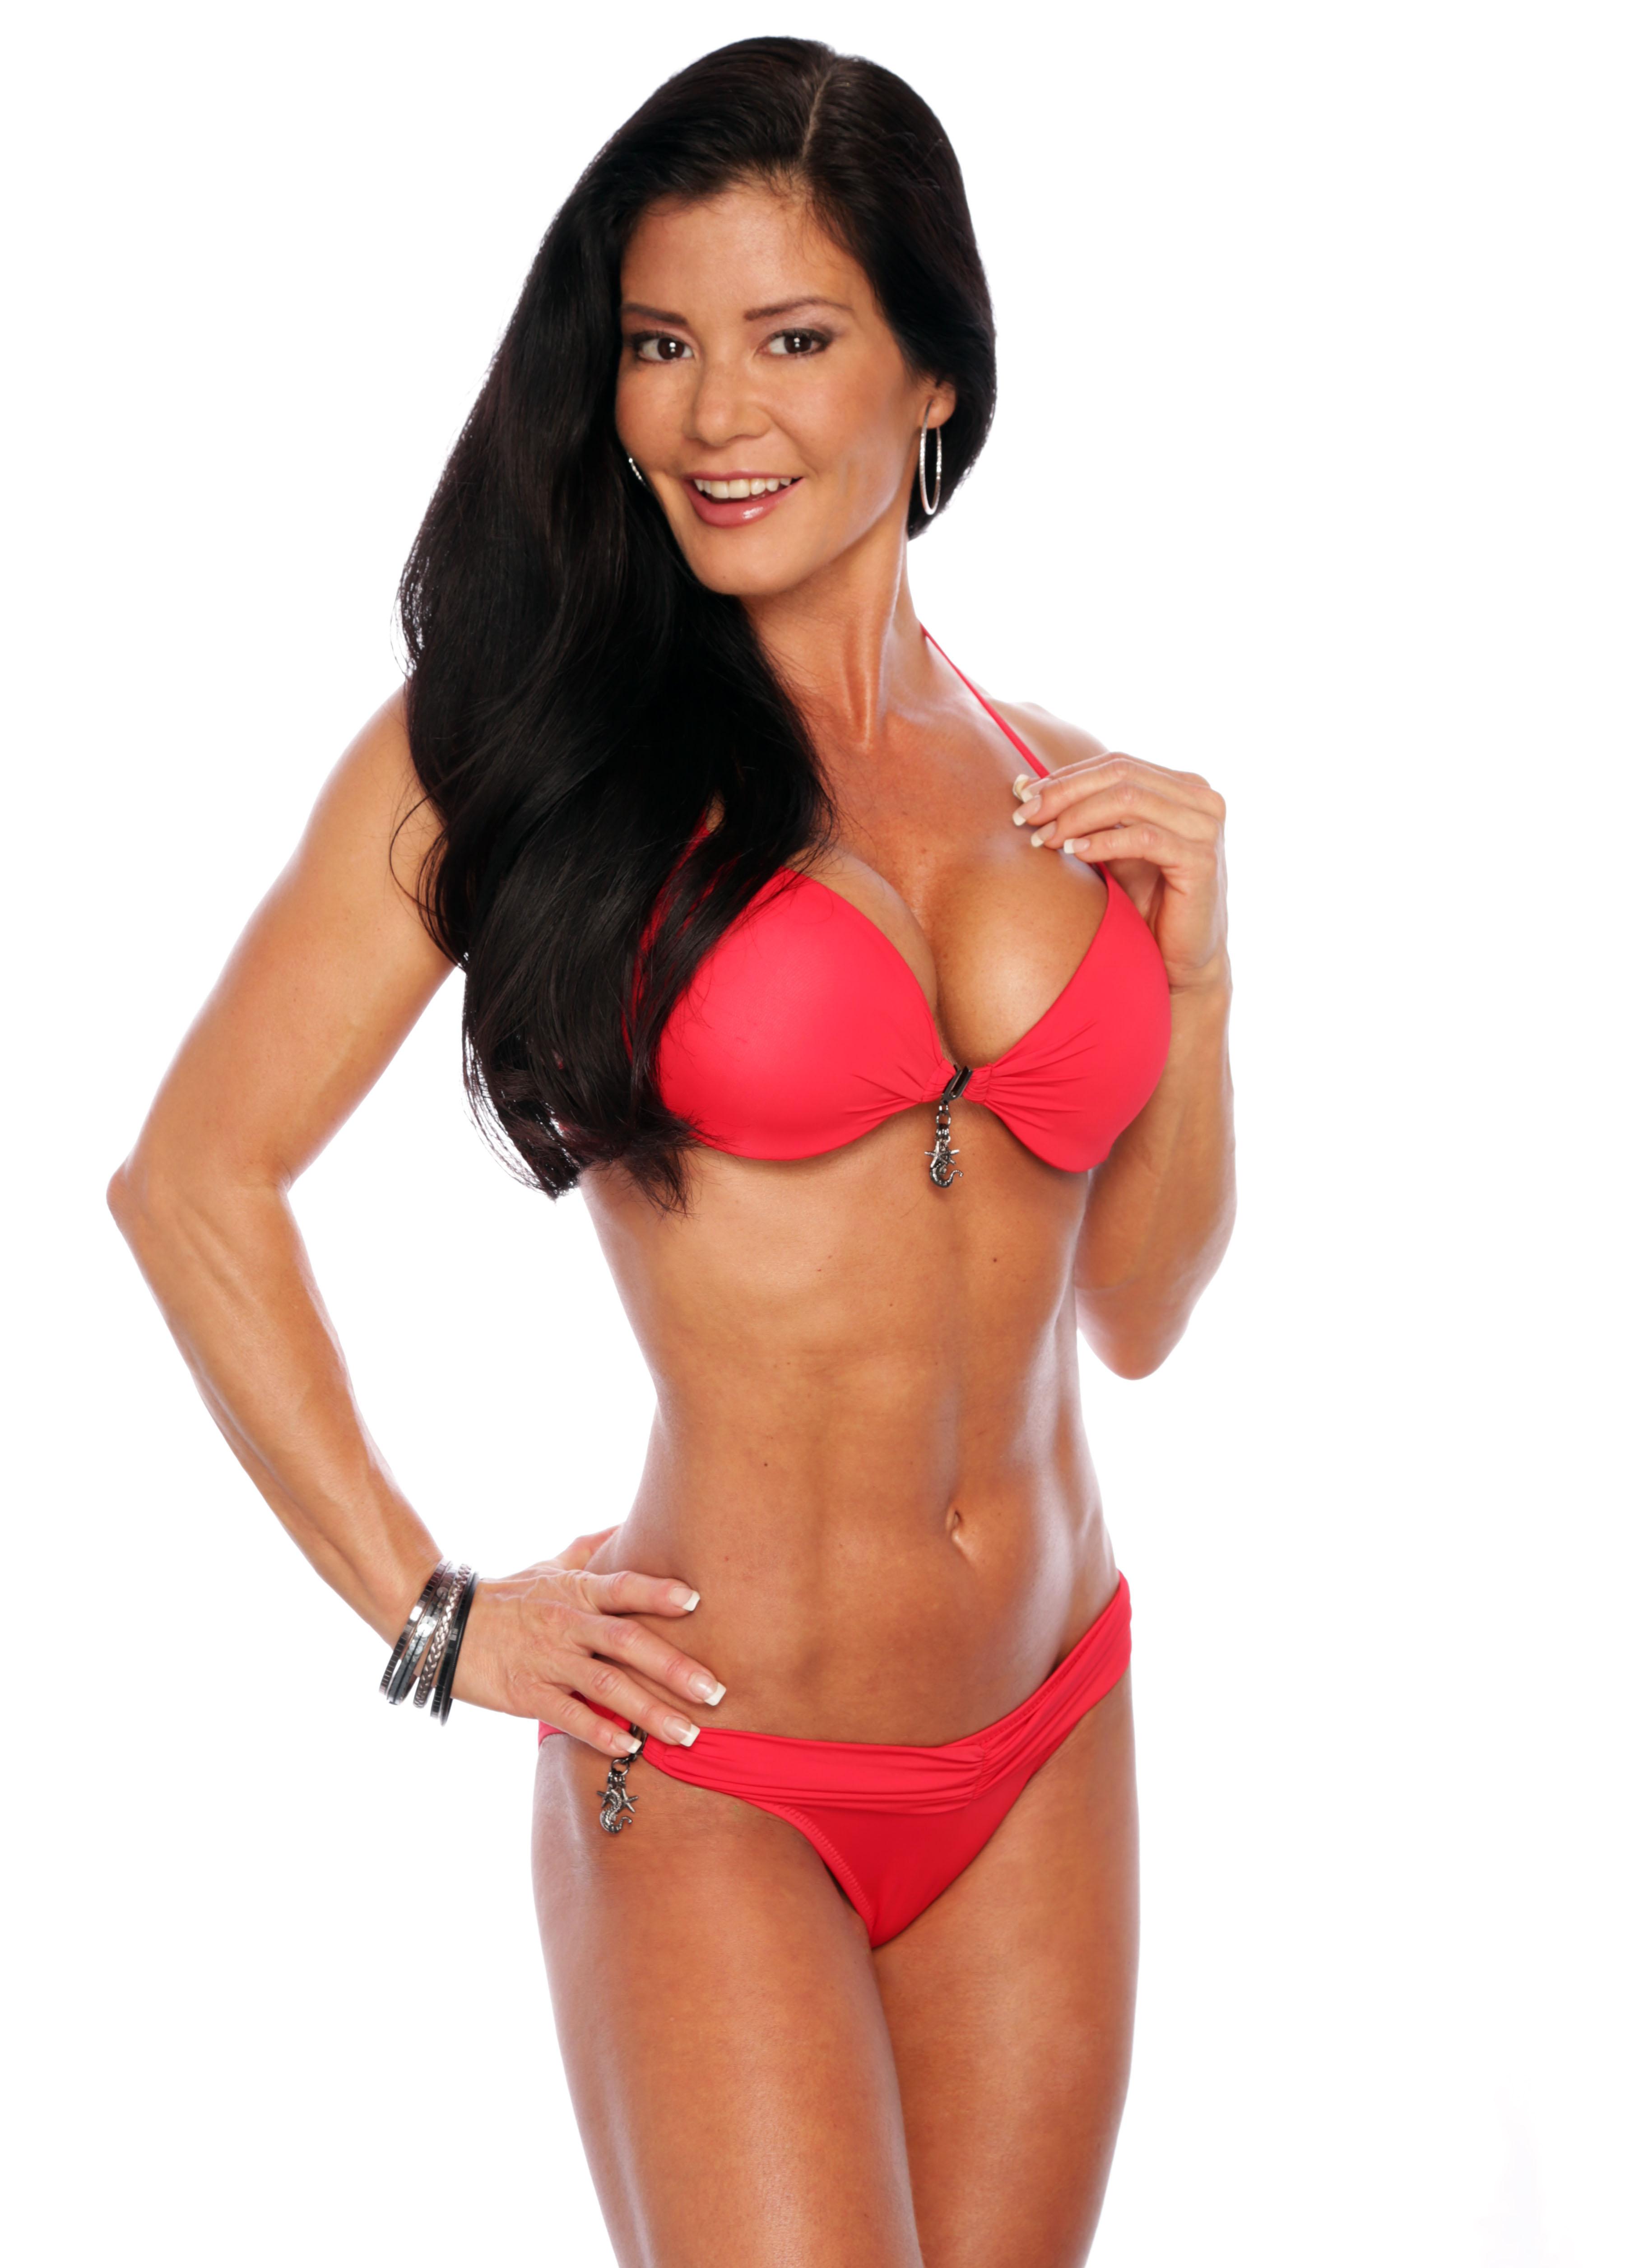 Red Bikini Studio Shot From April 2013 Dr Stacey Naito